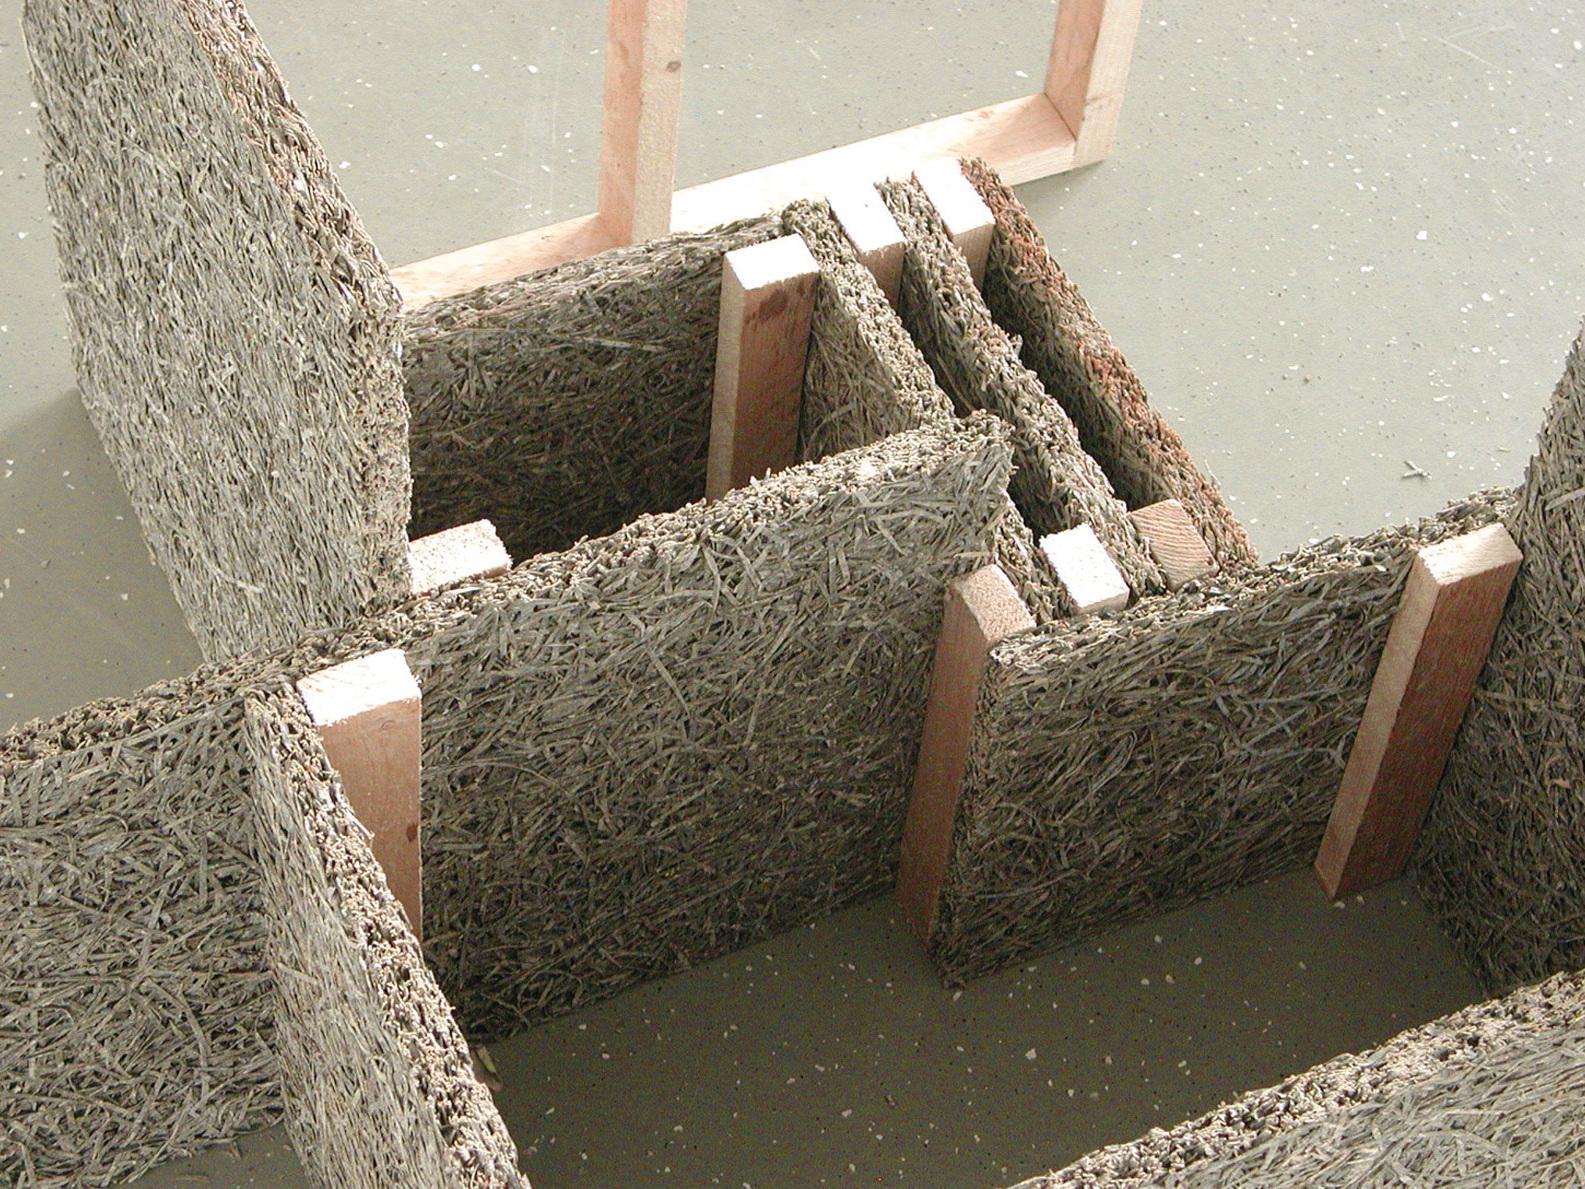 Kunstprojekt Büroauflösung mit Franka Hörnschemeyer - Materialmodell